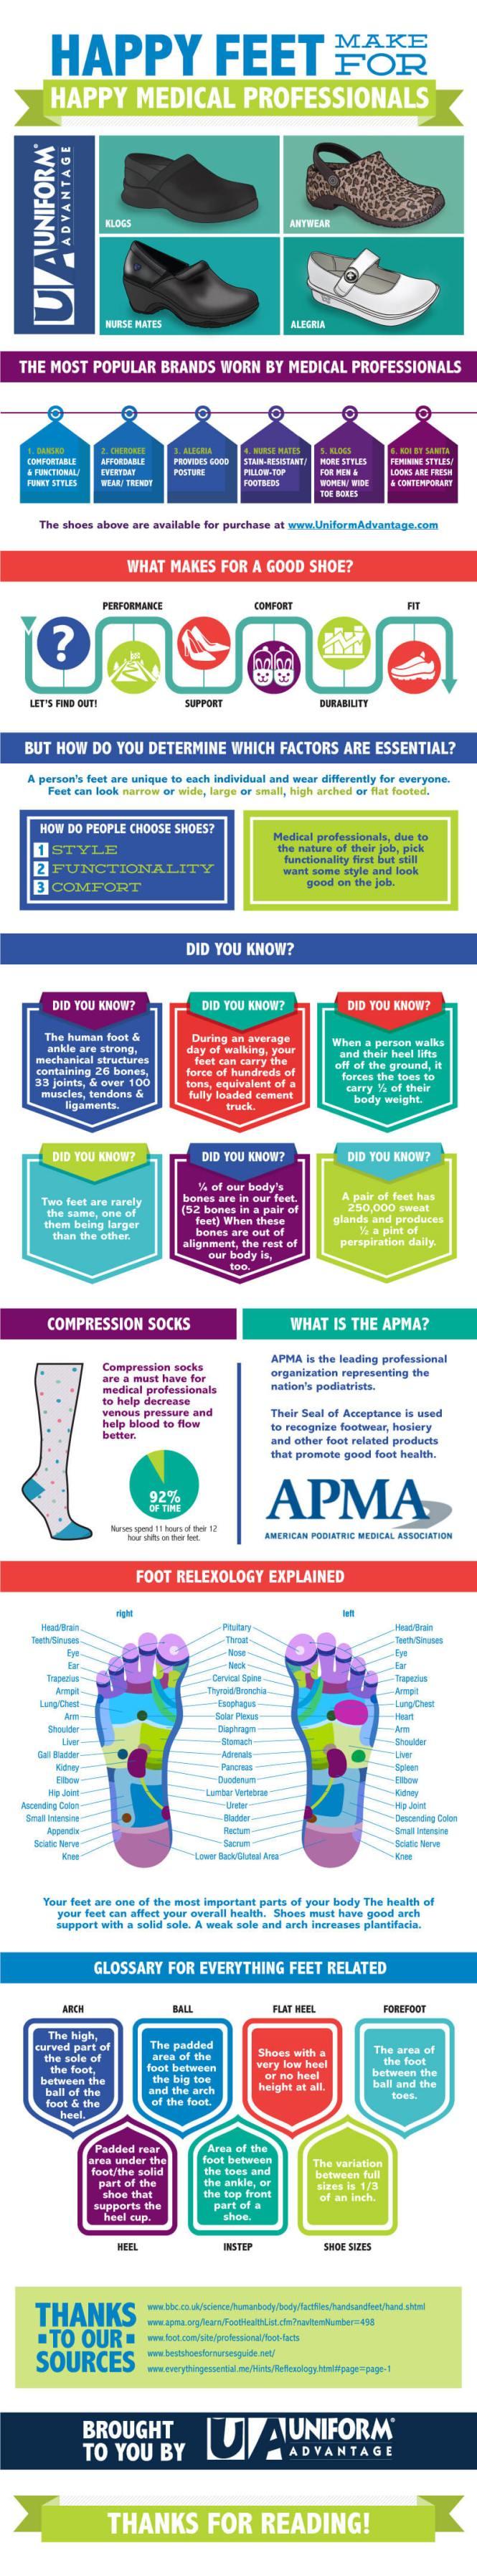 Happy Feet makes Happy Healthcare Professionals